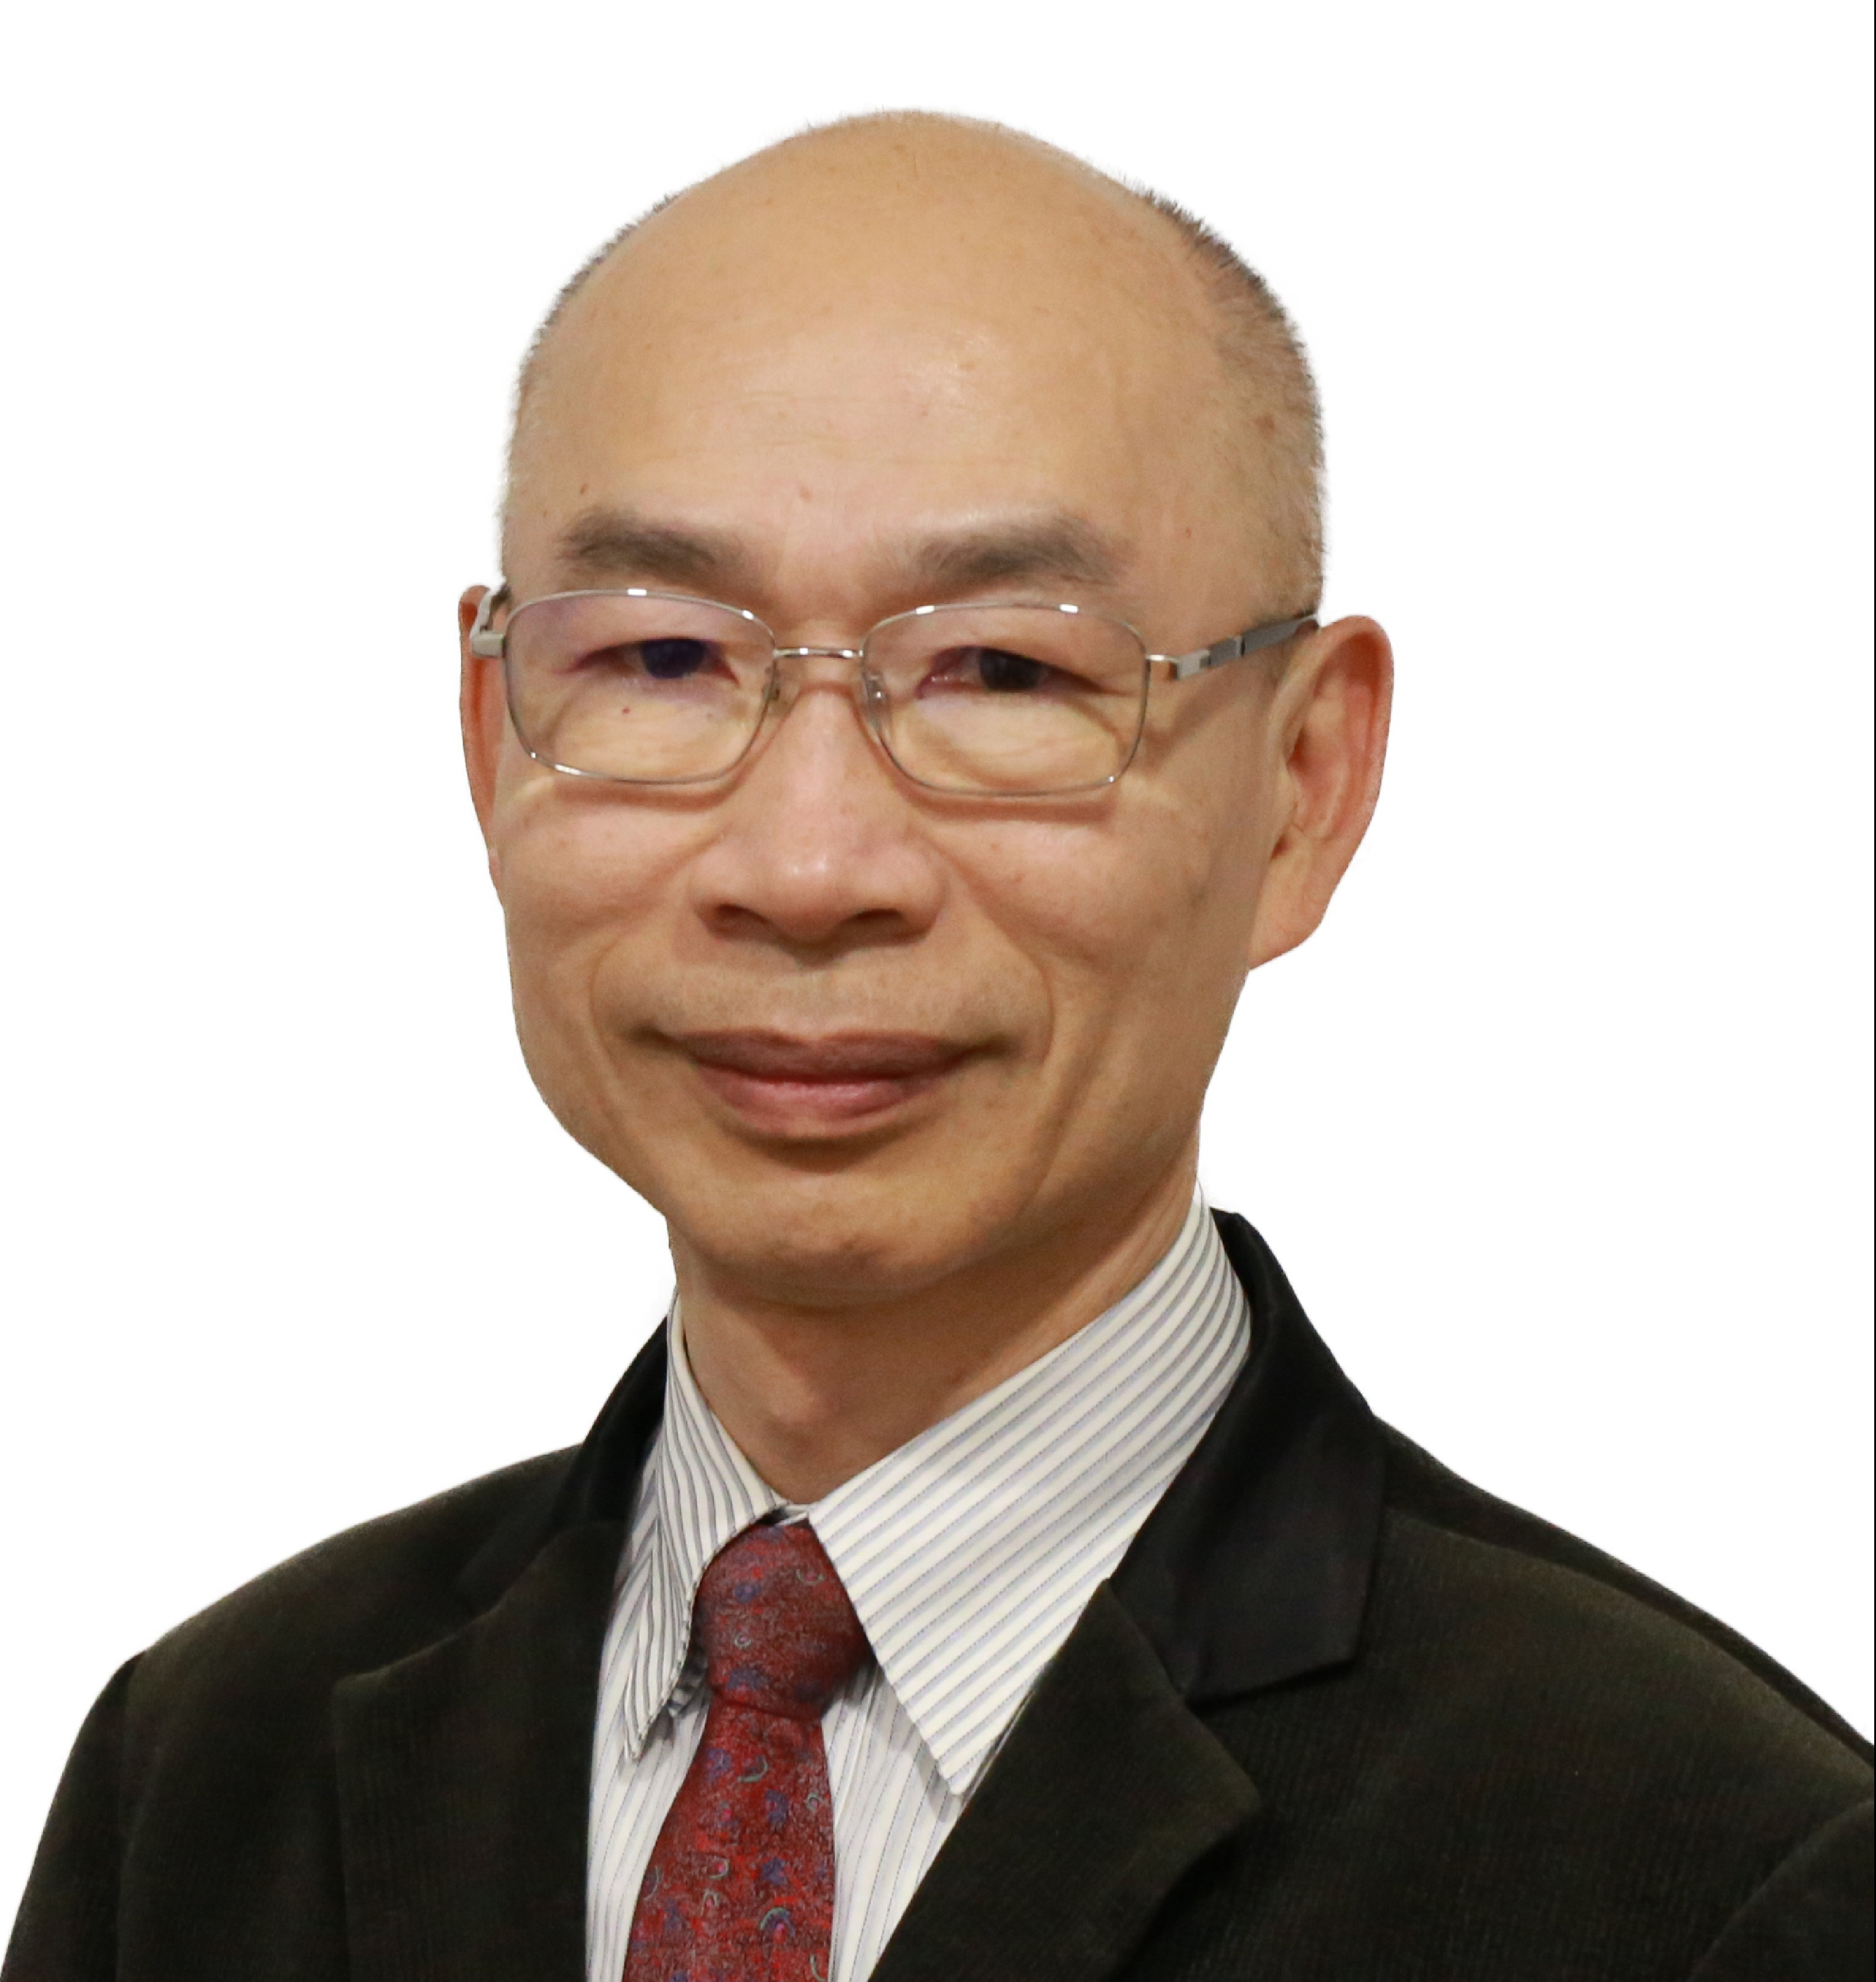 William Liao